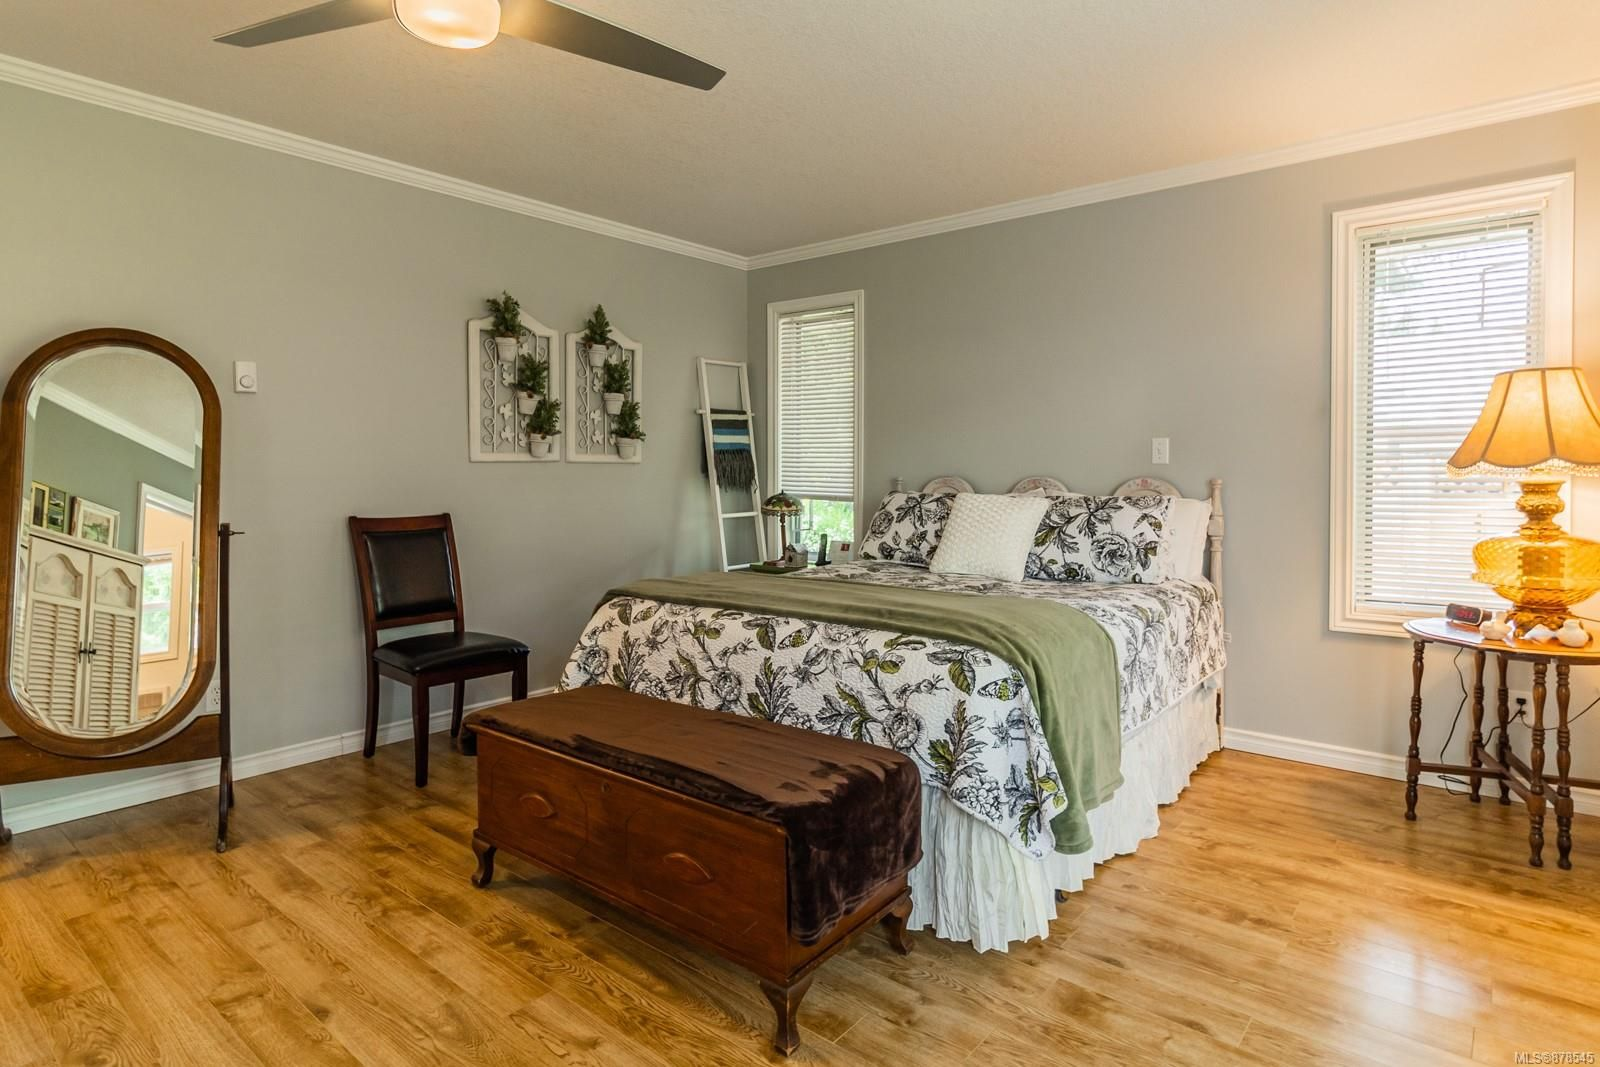 Photo 4: Photos: 1070 Symons Cres in : PQ Qualicum Beach House for sale (Parksville/Qualicum)  : MLS®# 878545